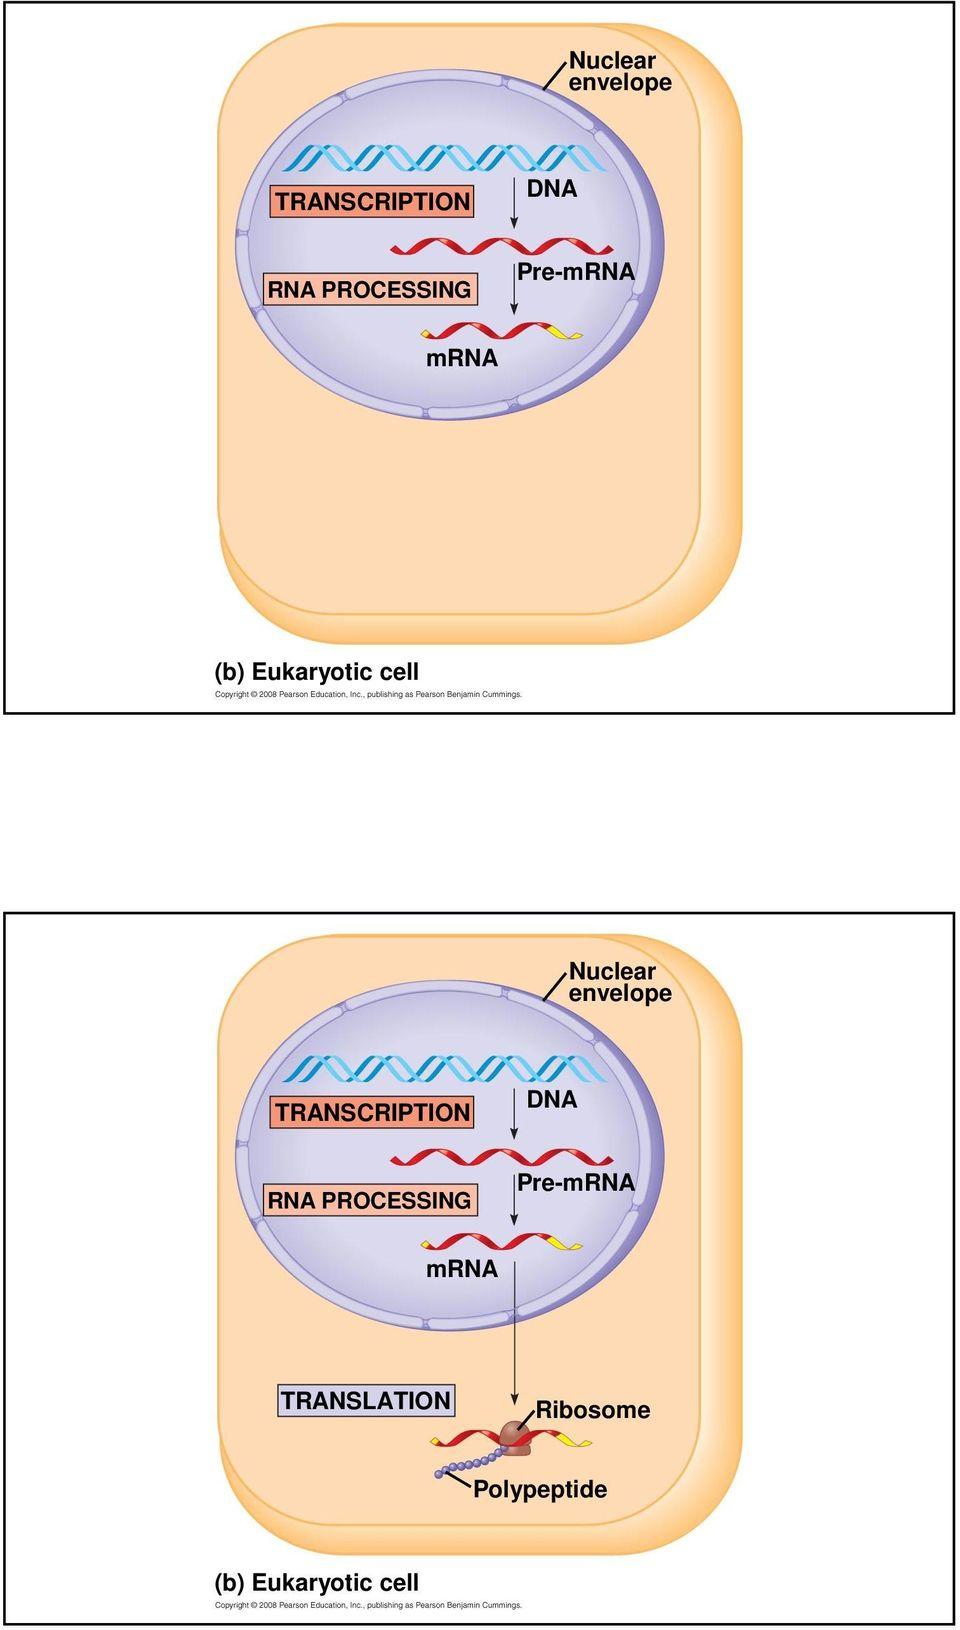 hight resolution of translation ribosome polypeptide b eukaryotic